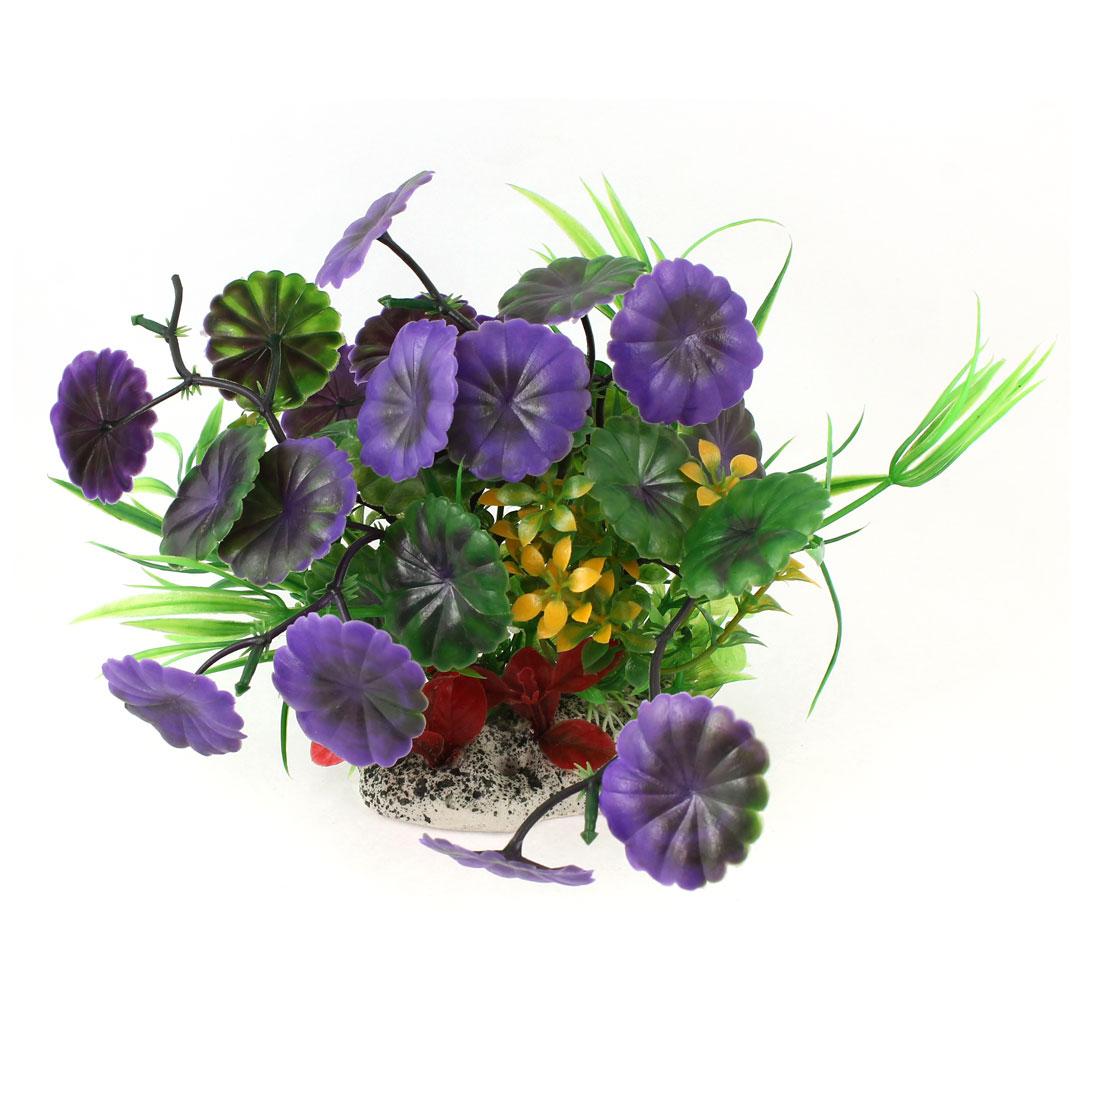 "Aquarium Landscaping Purple Green Manmade Floral Aquatic Plant 5.1"" Height"